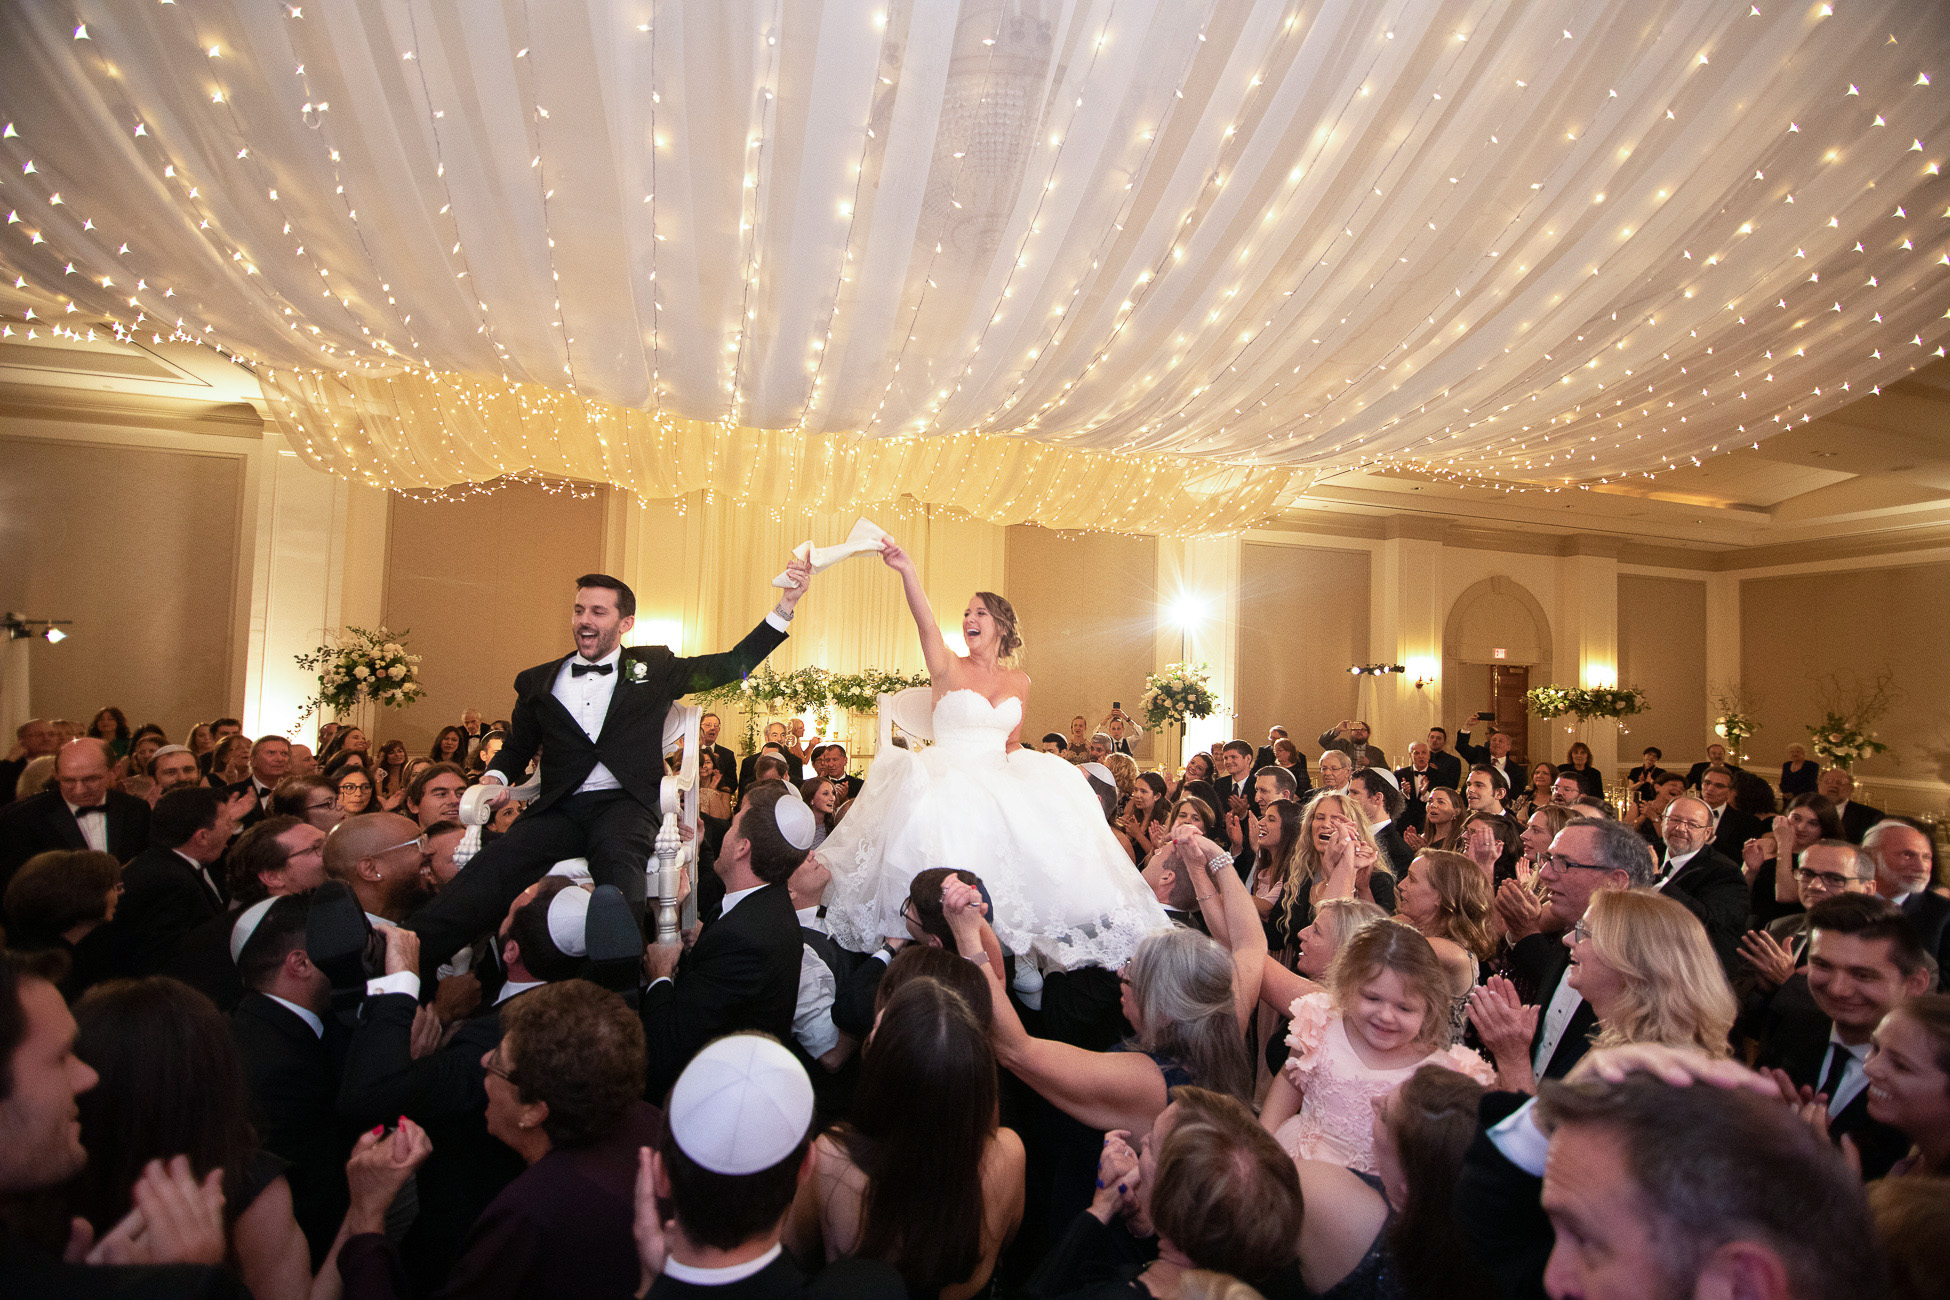 Wedding Reception Celebration - Photography by the Atlanta Wedding photographers at AtlantaArtisticWeddings